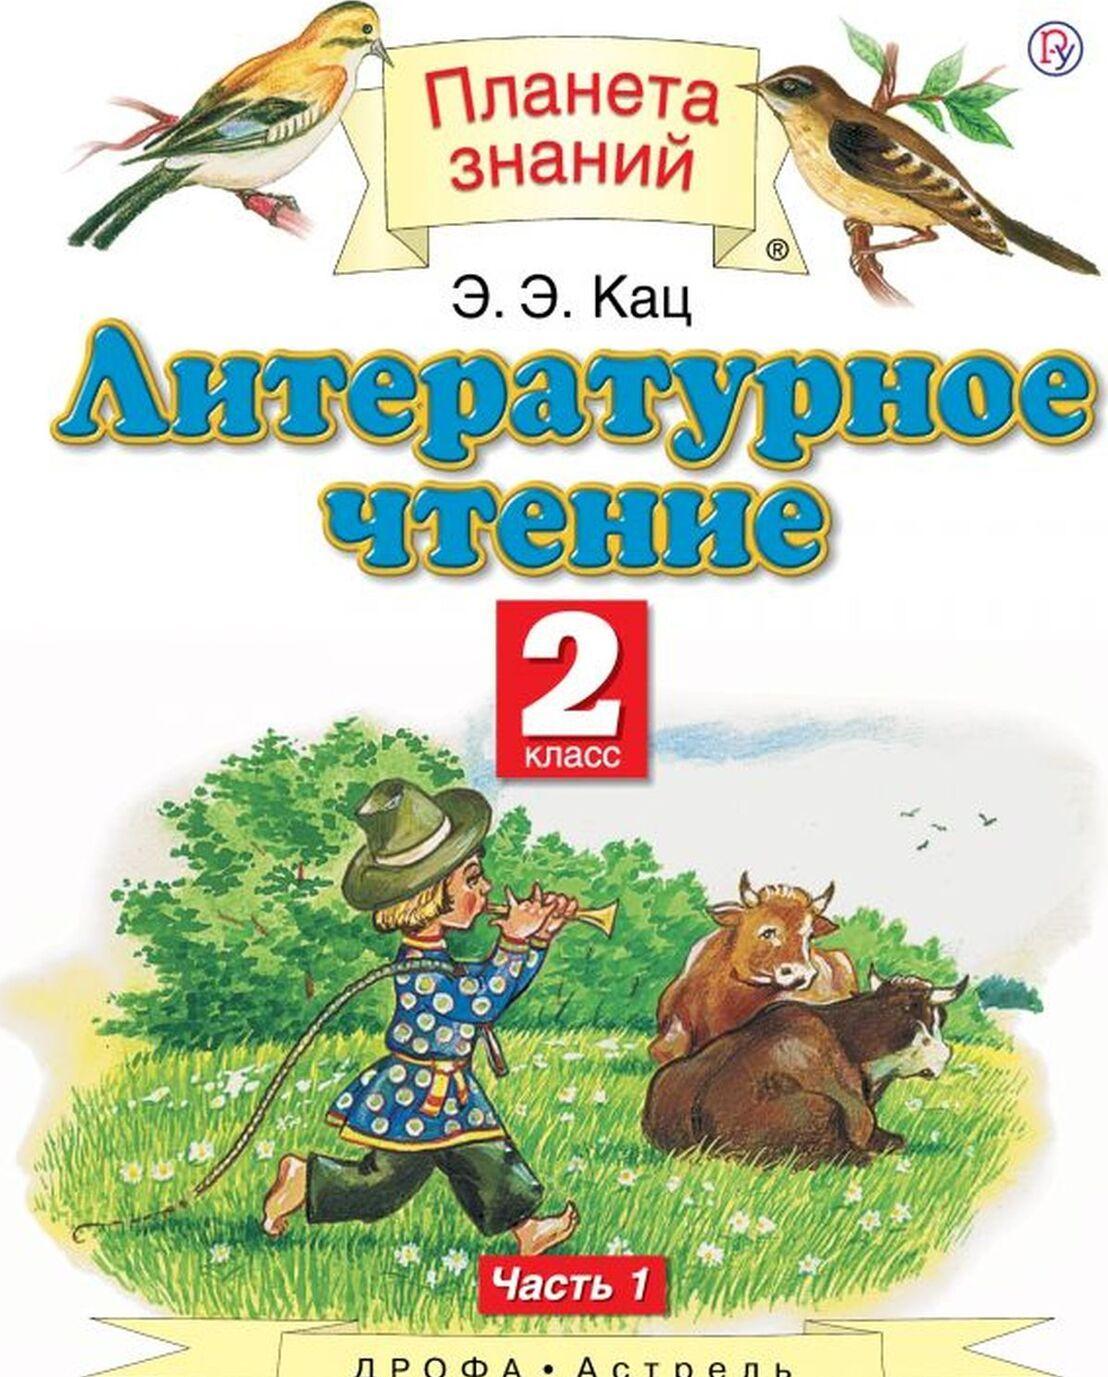 Literaturnoe chtenie. 2 klass. Uchebnik. V 2-kh chastjakh. Chast 1 | Kats Ella Elkhanonovna